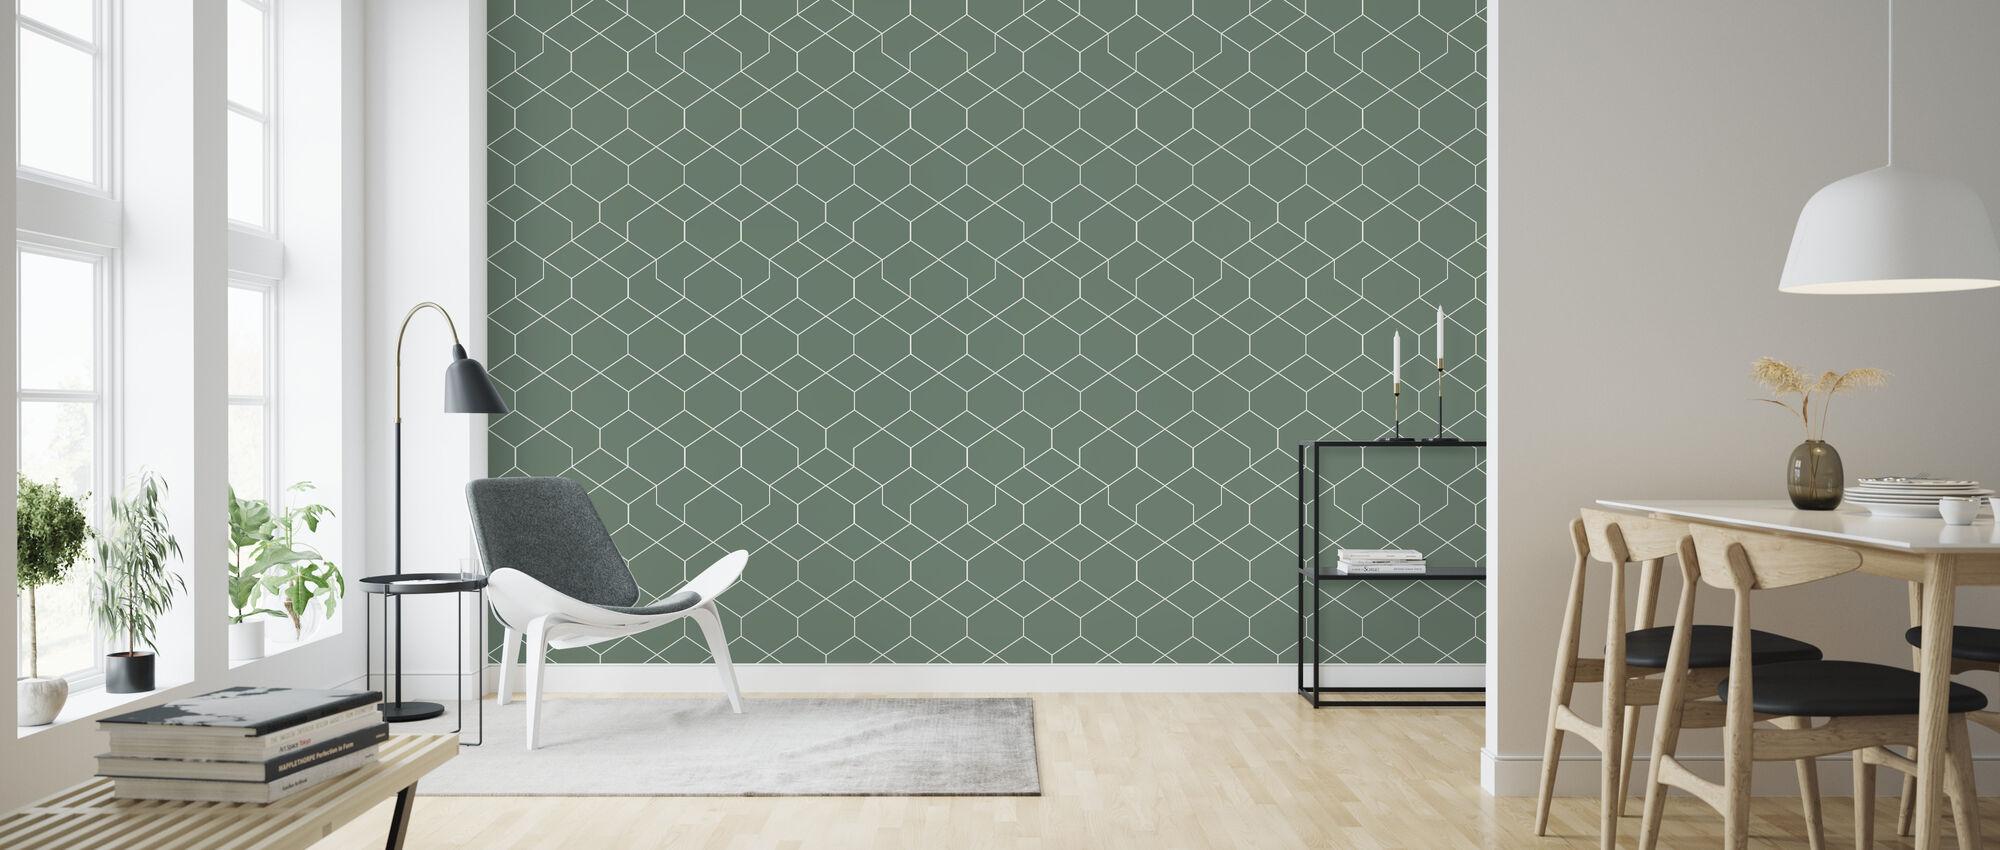 Honeycomb Green - Wallpaper - Living Room